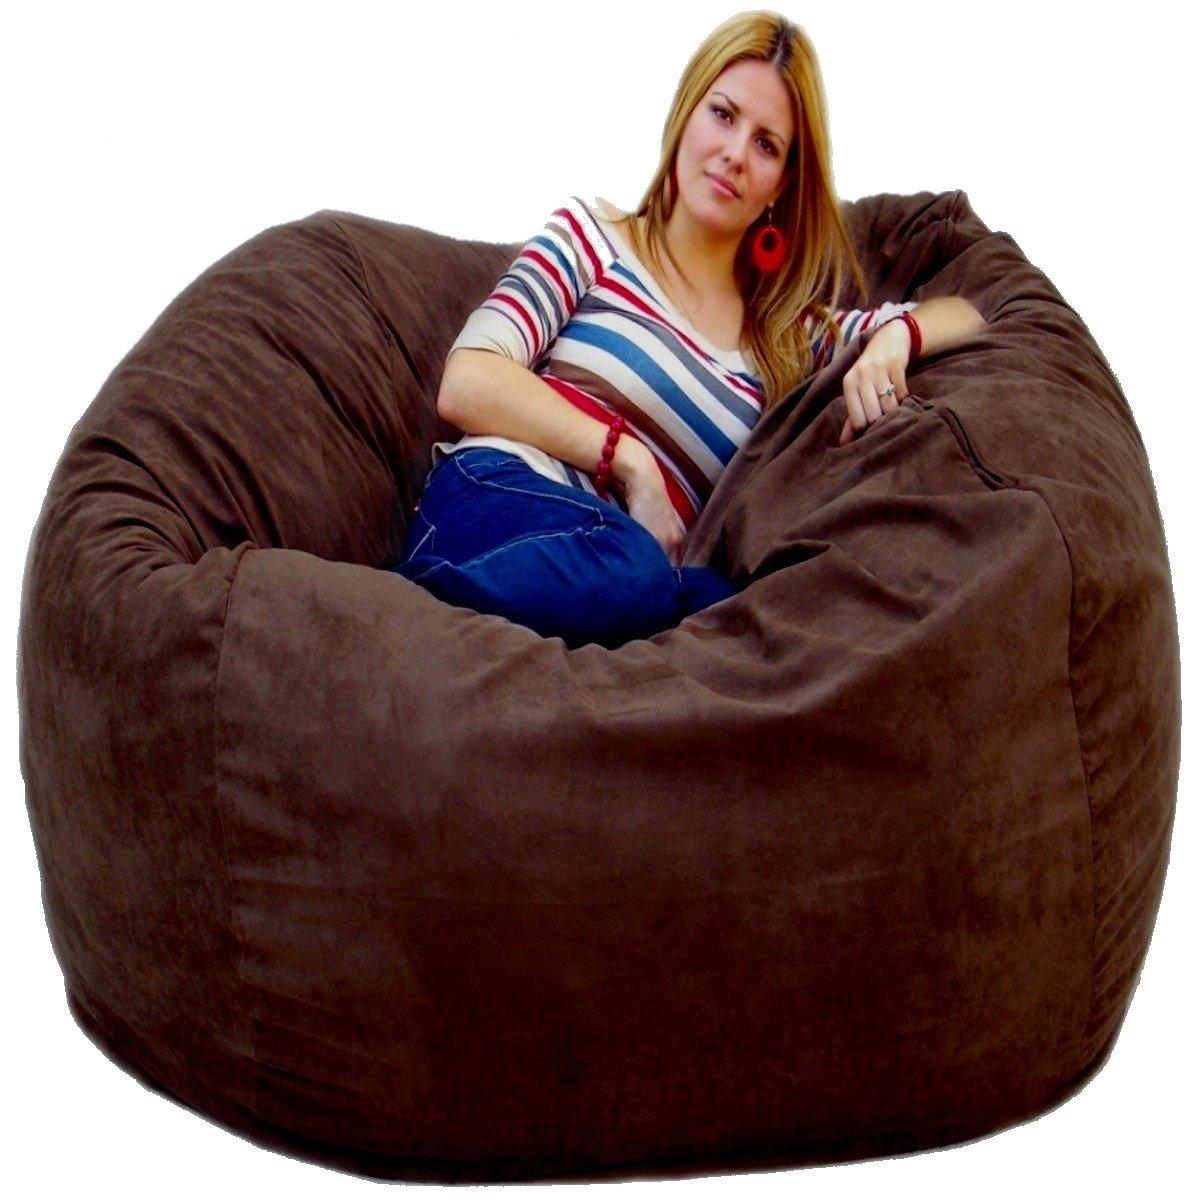 Pleasing Cozy Sack 5 Feet Bean Bag Chair Large Chocolate Inzonedesignstudio Interior Chair Design Inzonedesignstudiocom